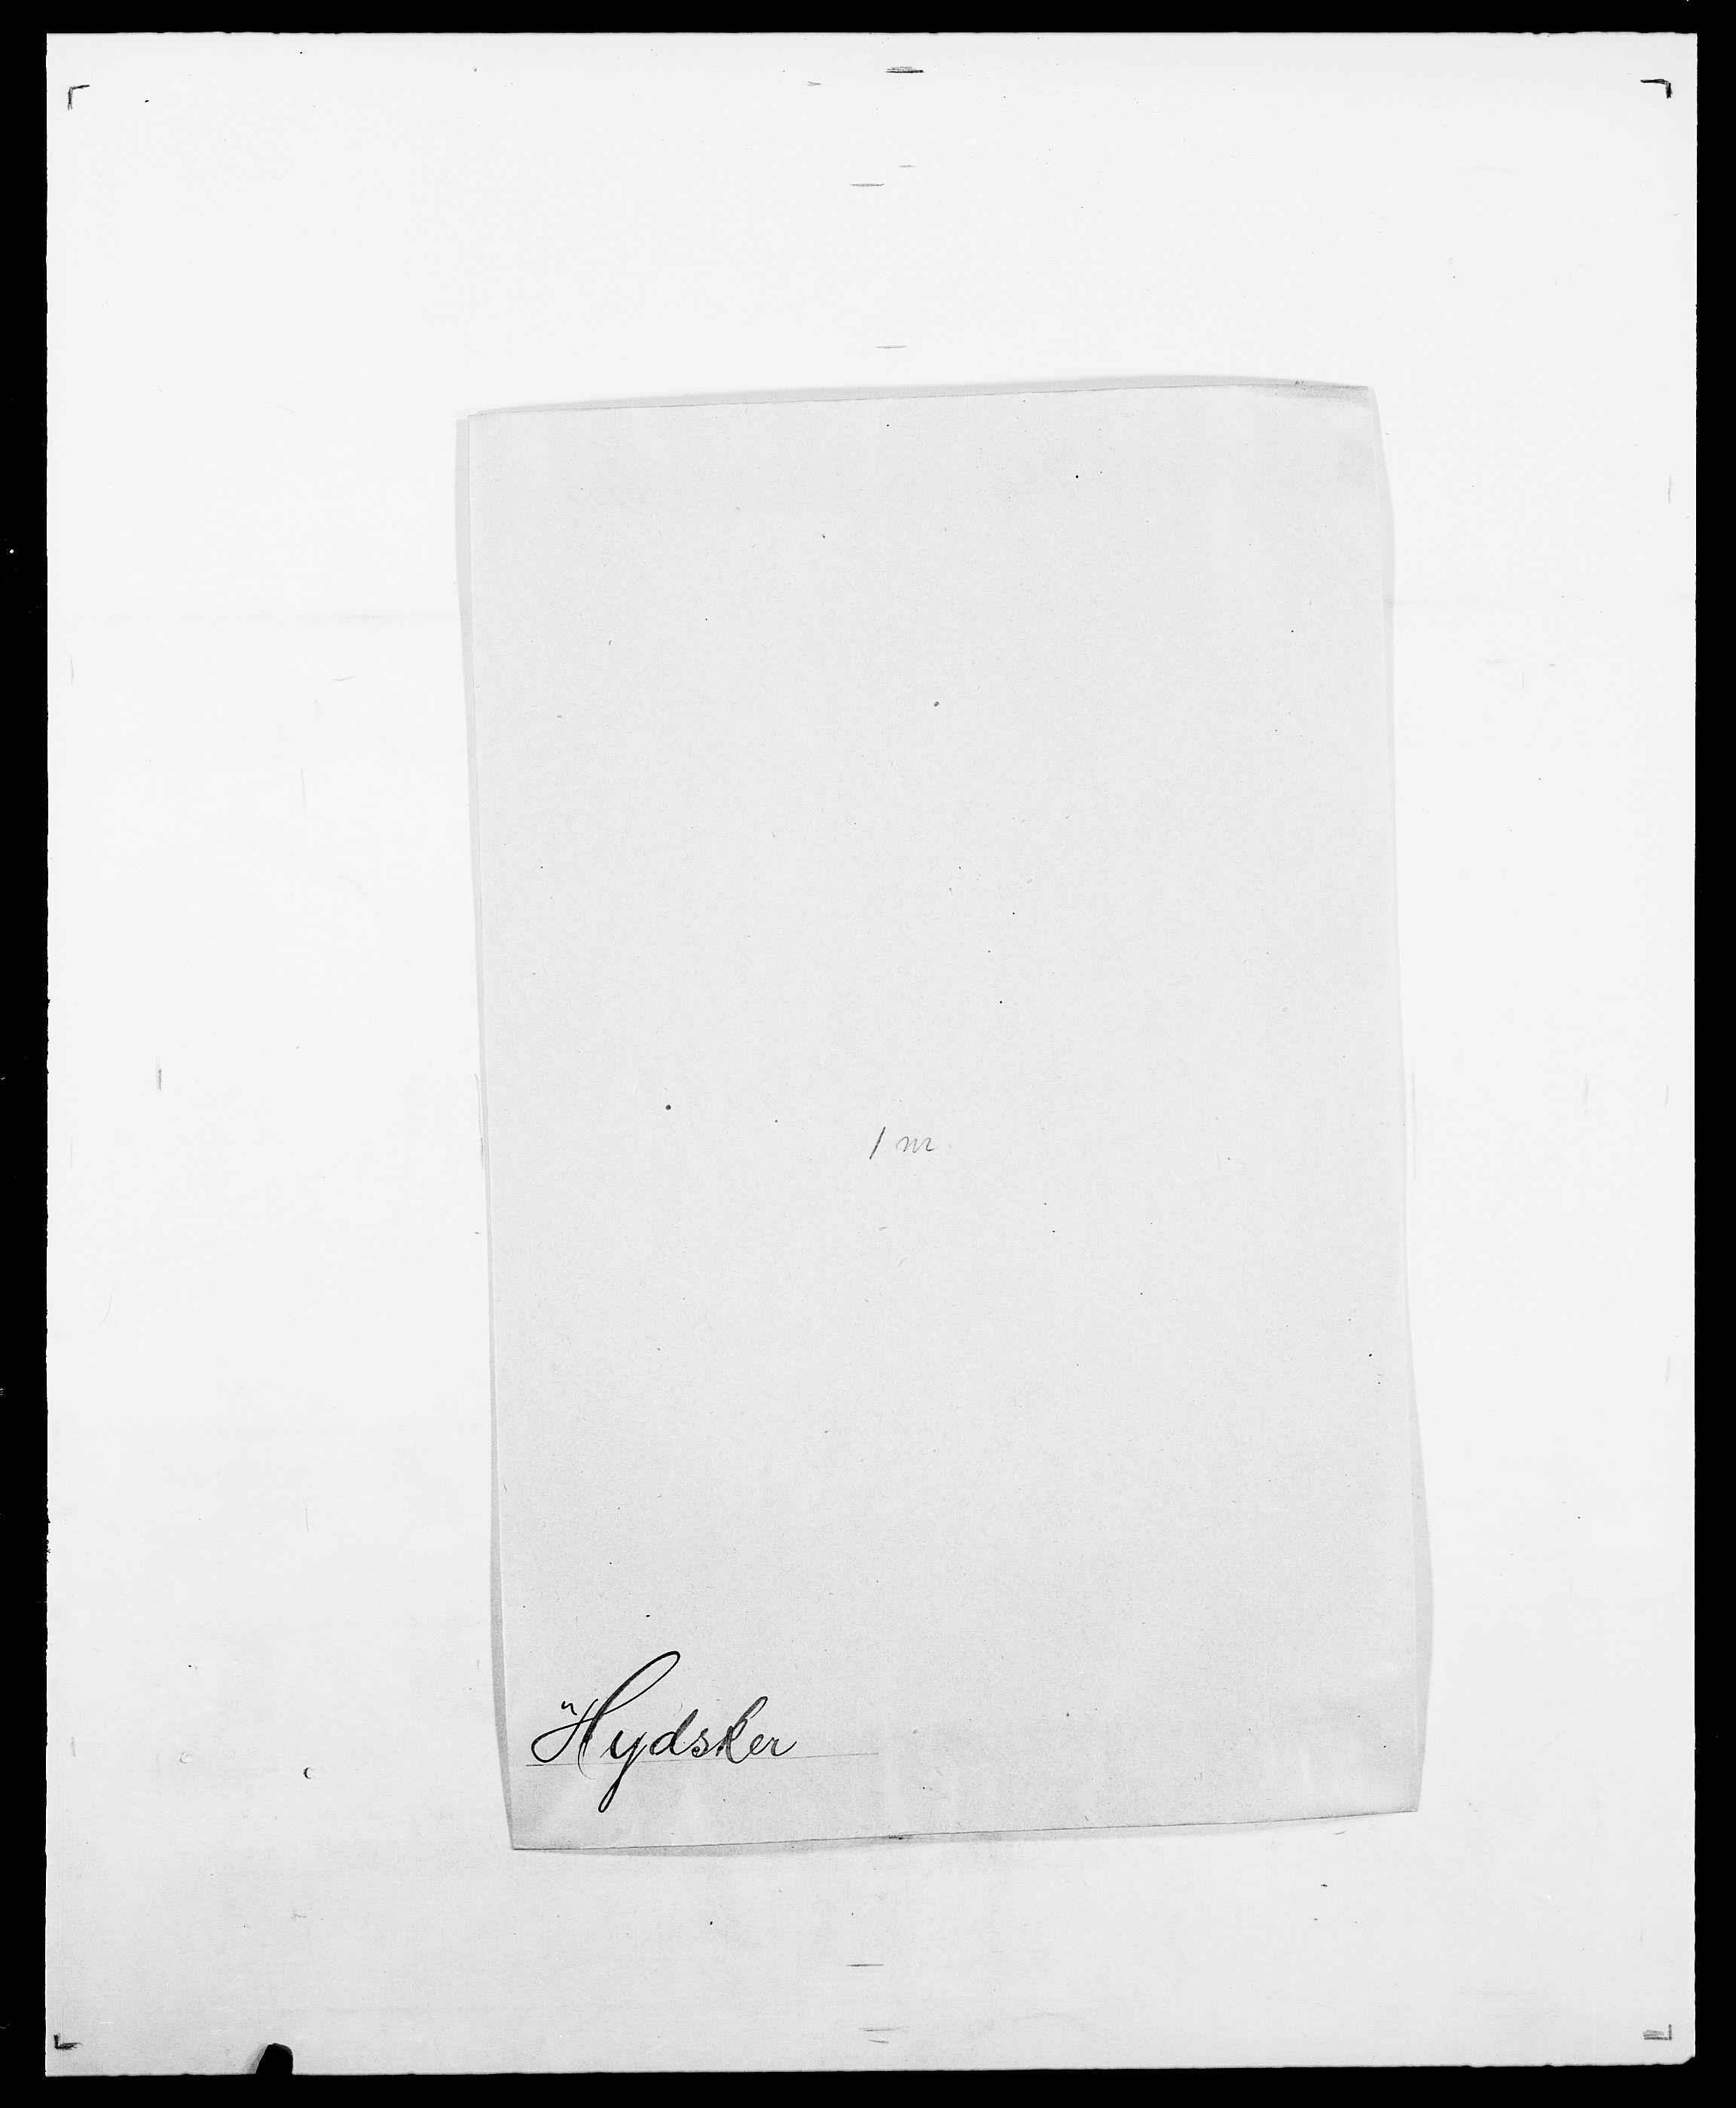 SAO, Delgobe, Charles Antoine - samling, D/Da/L0019: van der Hude - Joys, s. 243